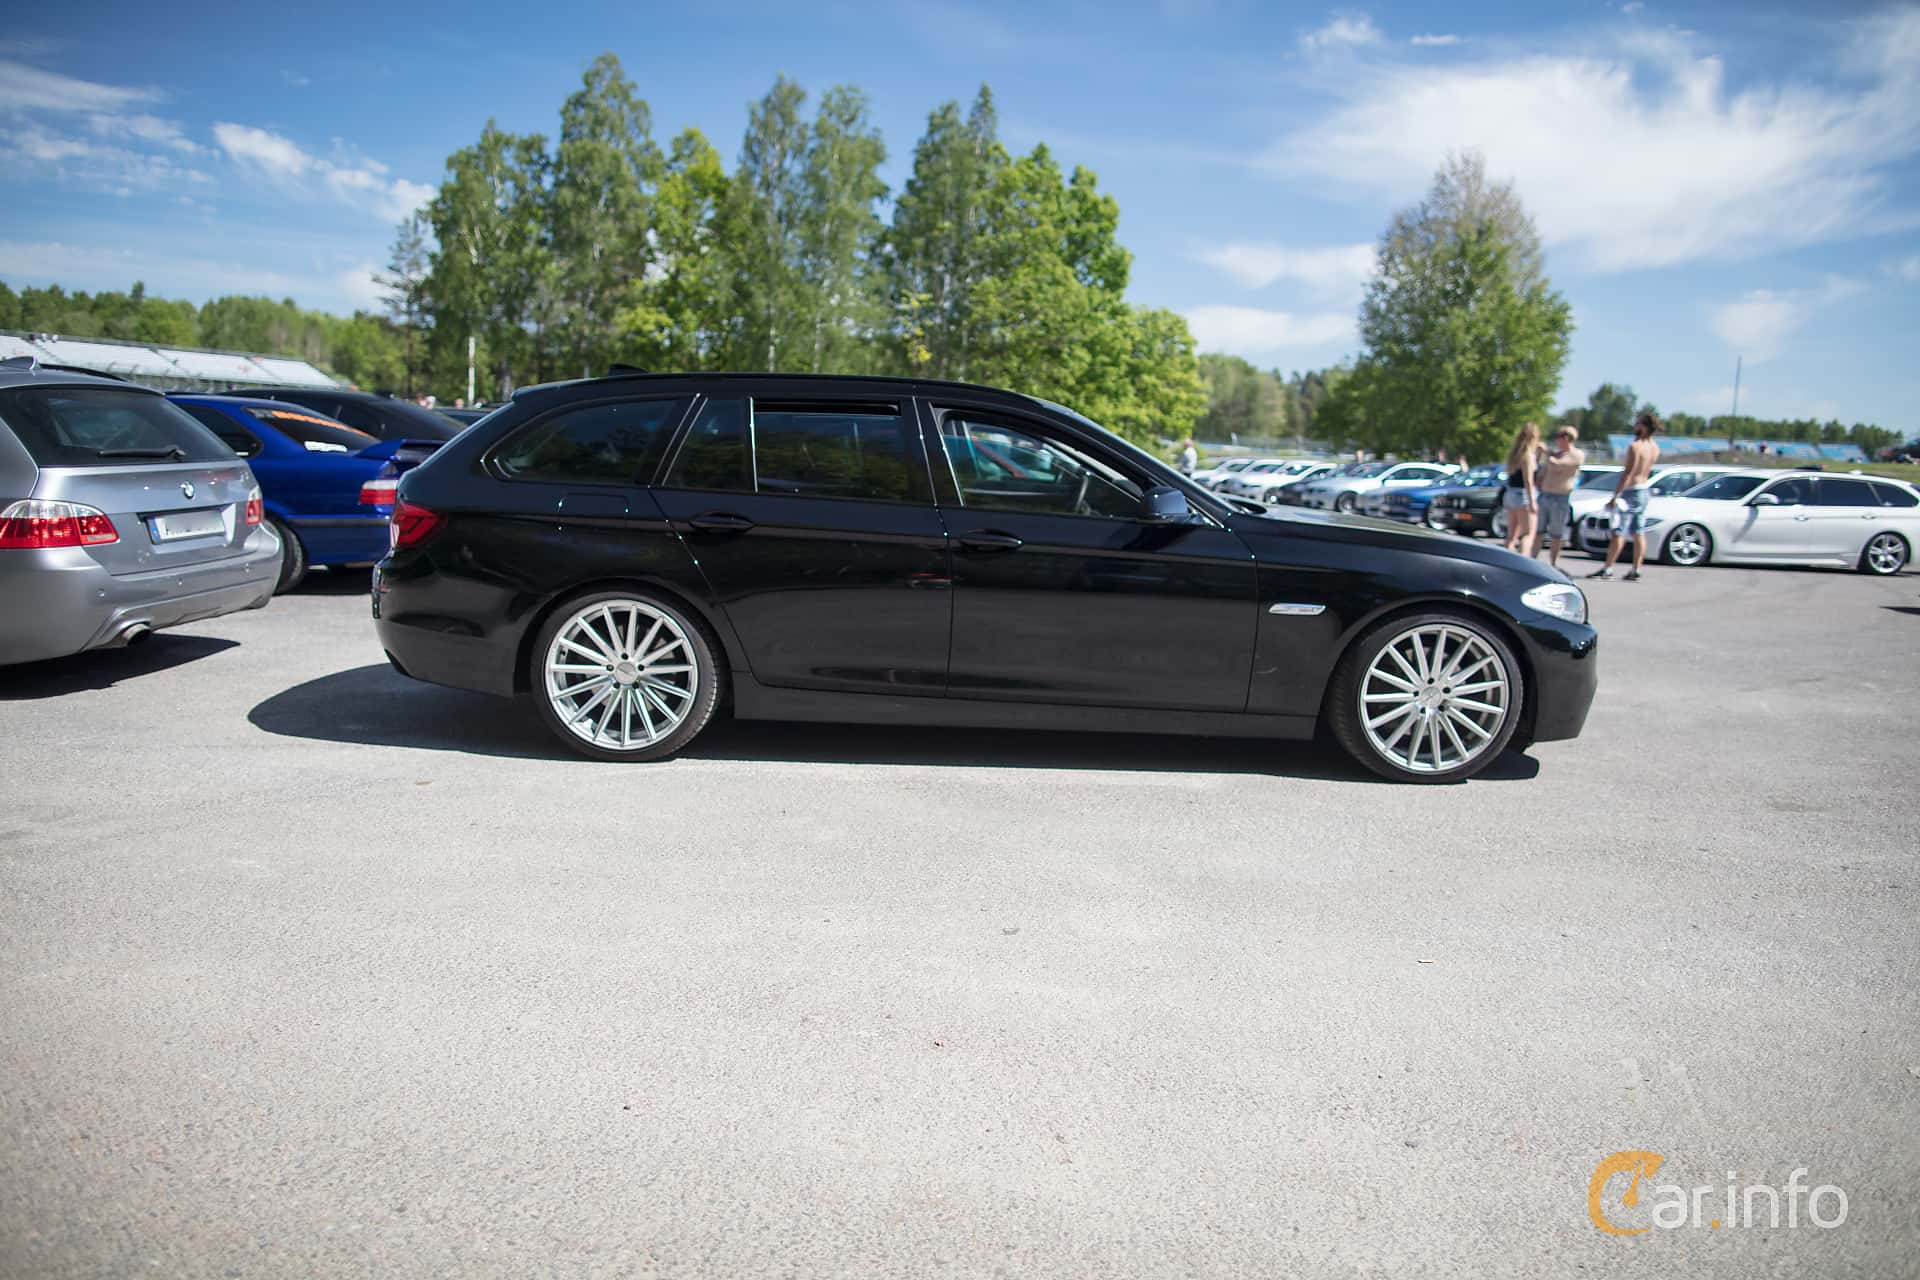 BMW 530d Touring 258hp 2012